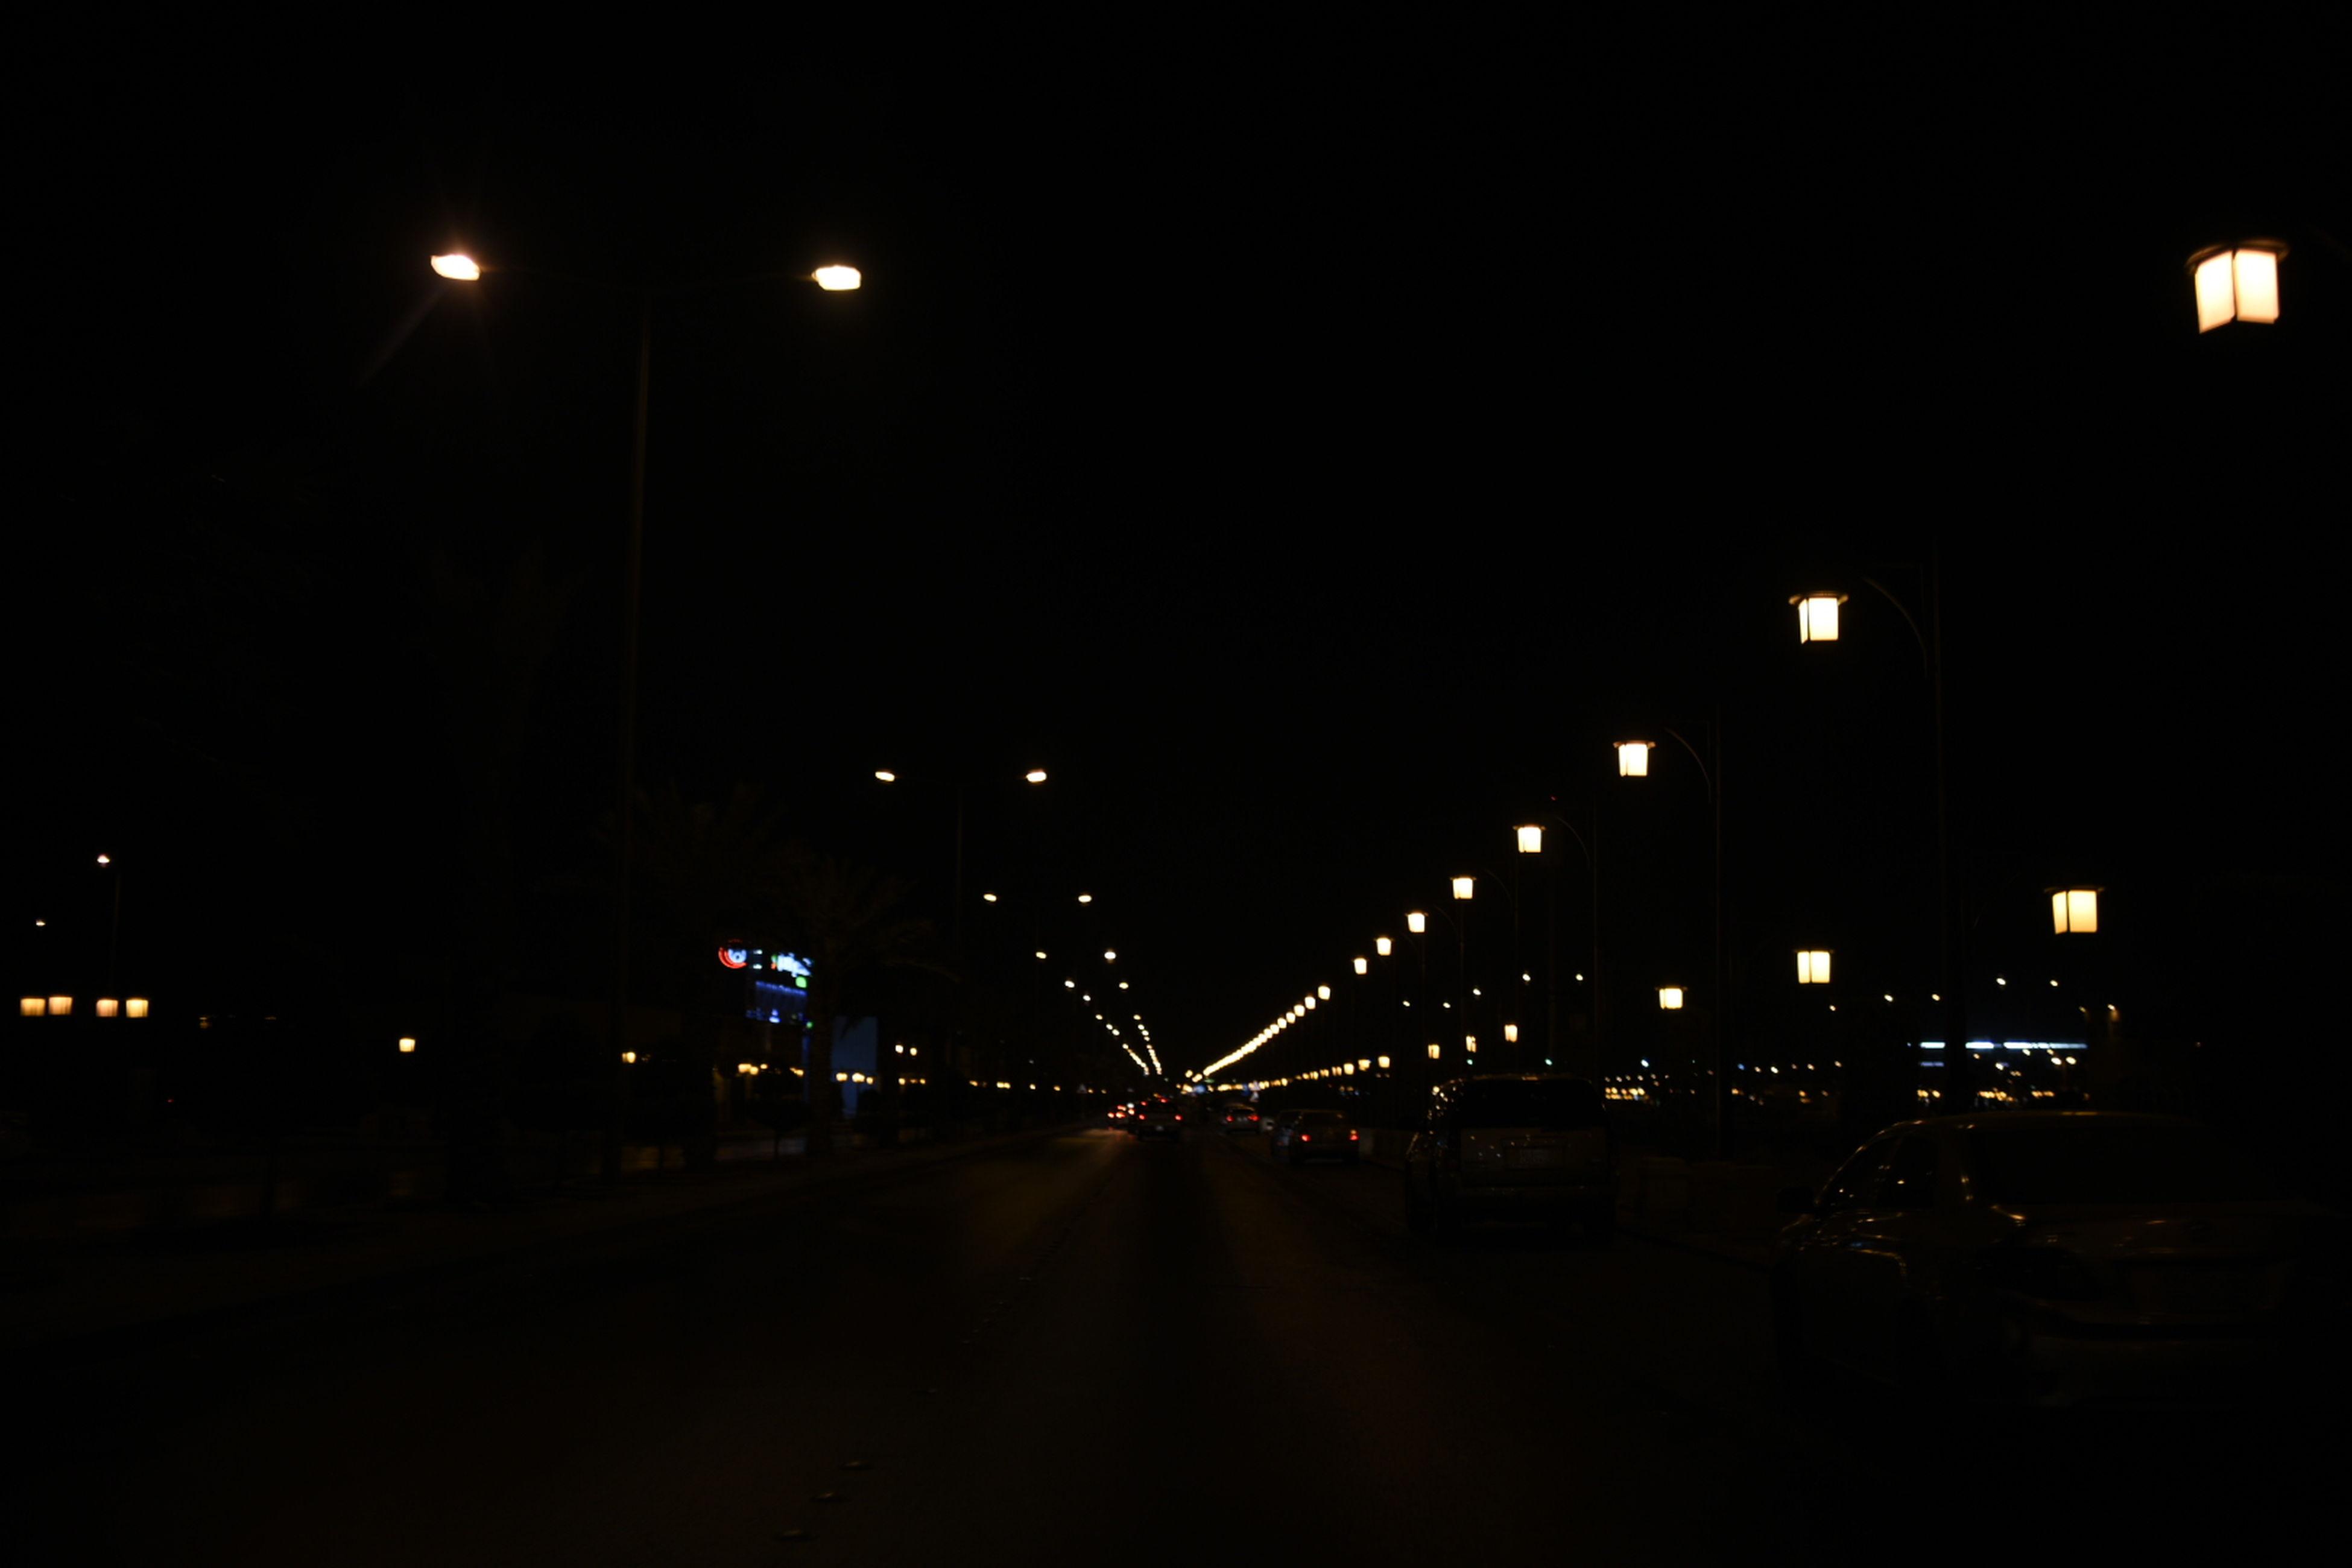 illuminated, night, transportation, road, the way forward, diminishing perspective, dark, vanishing point, sky, long, city life, lit, tail light, journey, darkness